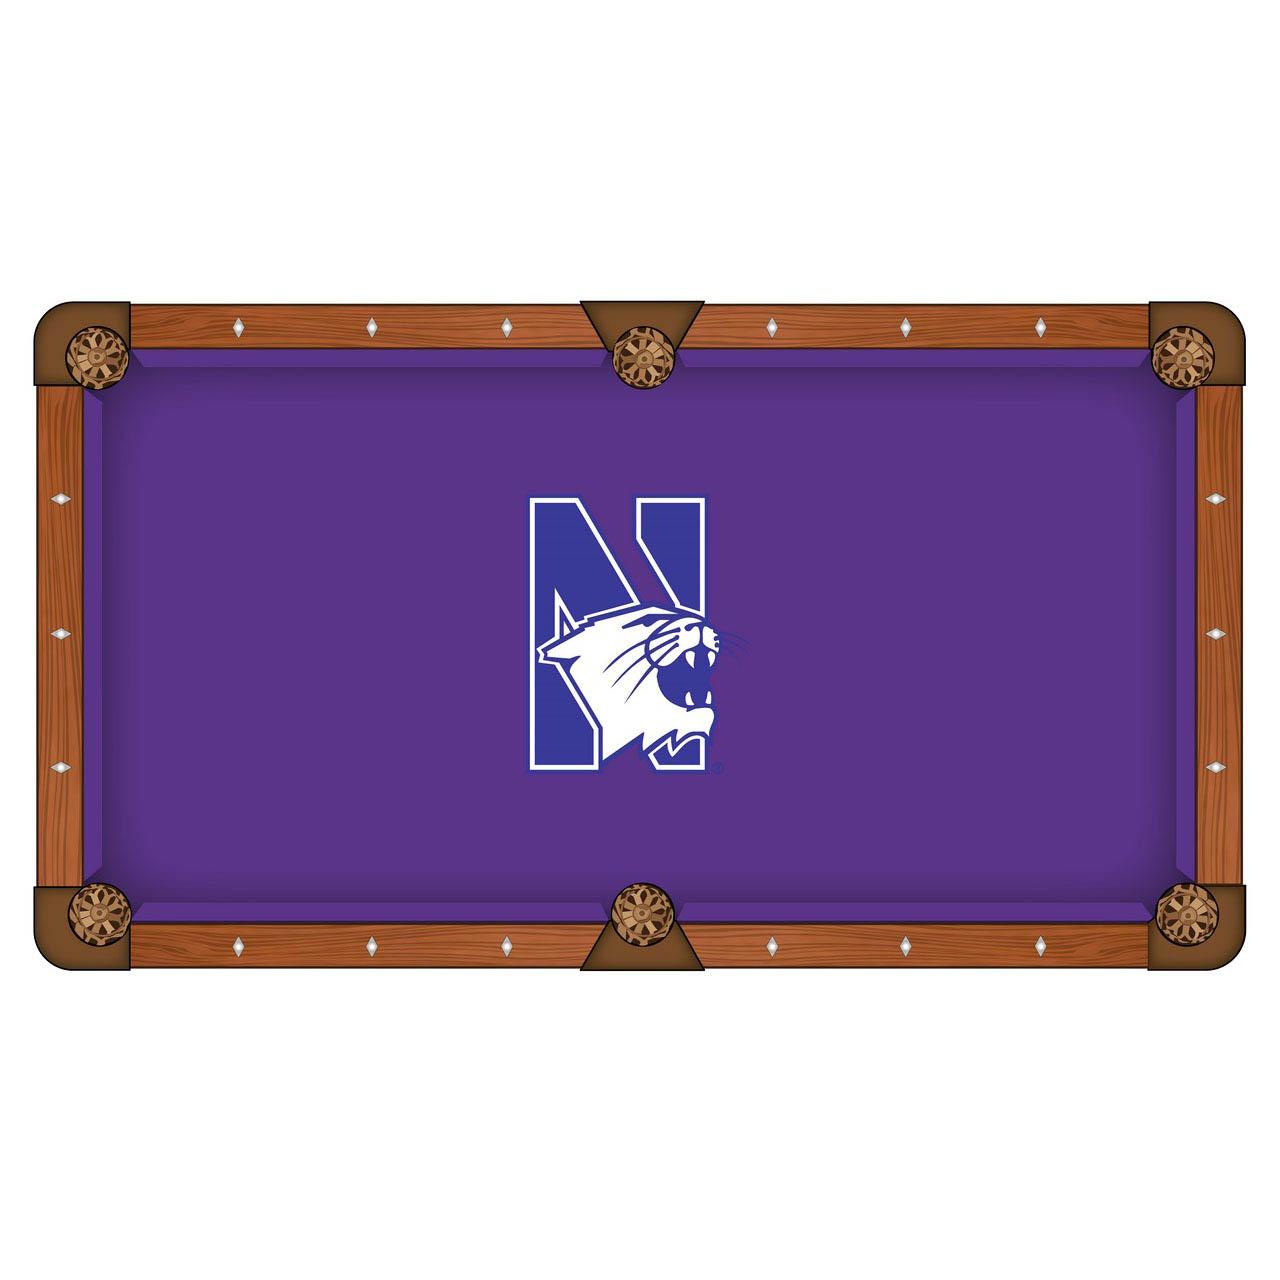 Design Northwestern University Pool Table Cloth Product Photo